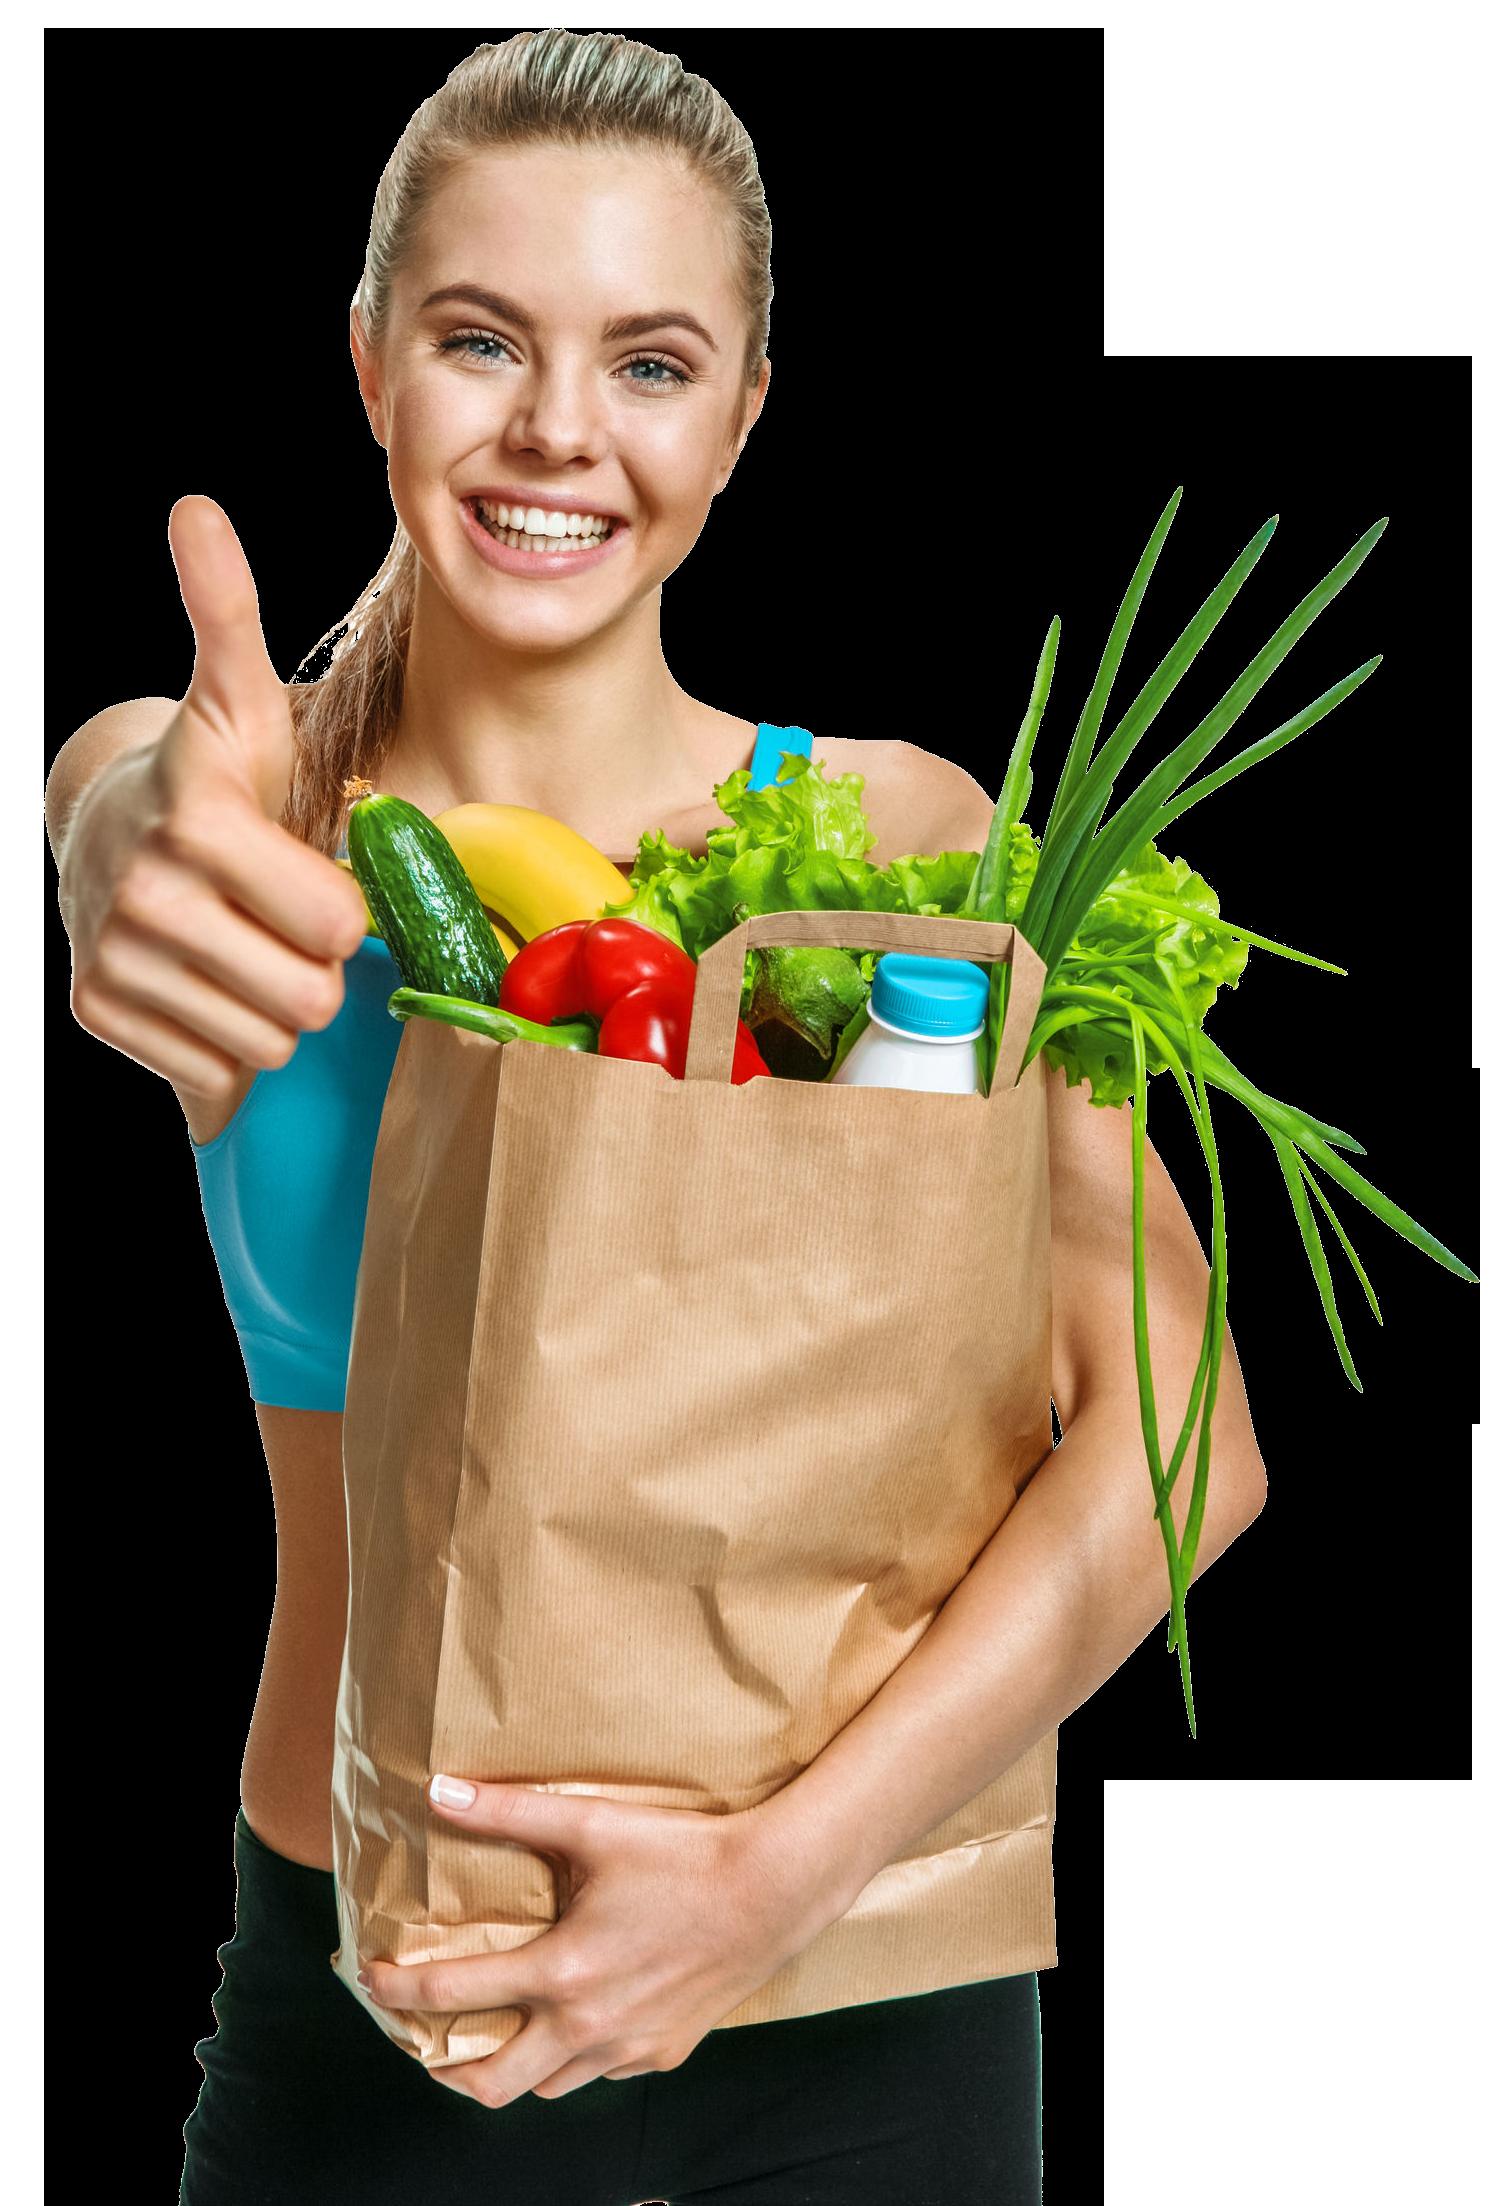 Frau die sich gesund ernährt